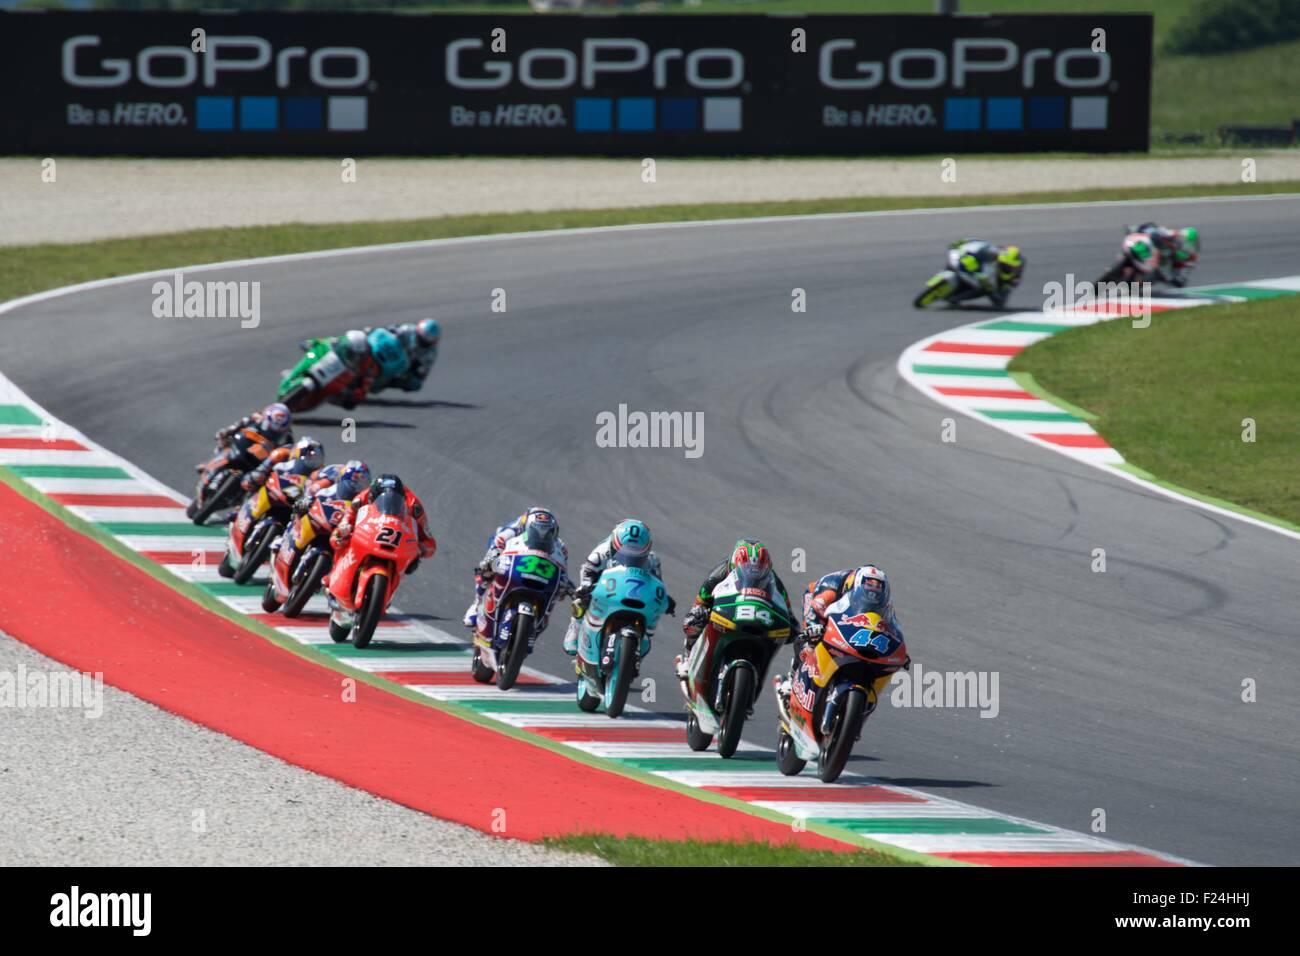 Moto3 Stock Photos & Moto3 Stock Images - Alamy